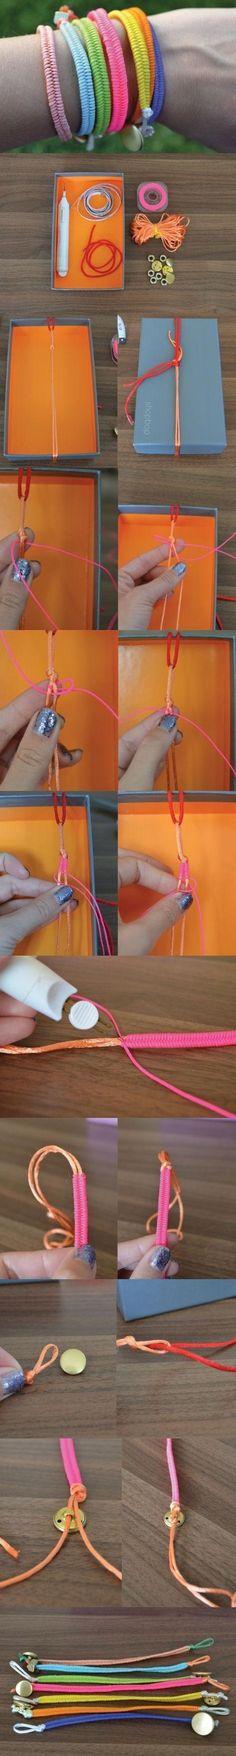 DIY Fishtail Bracelet DIY Projects